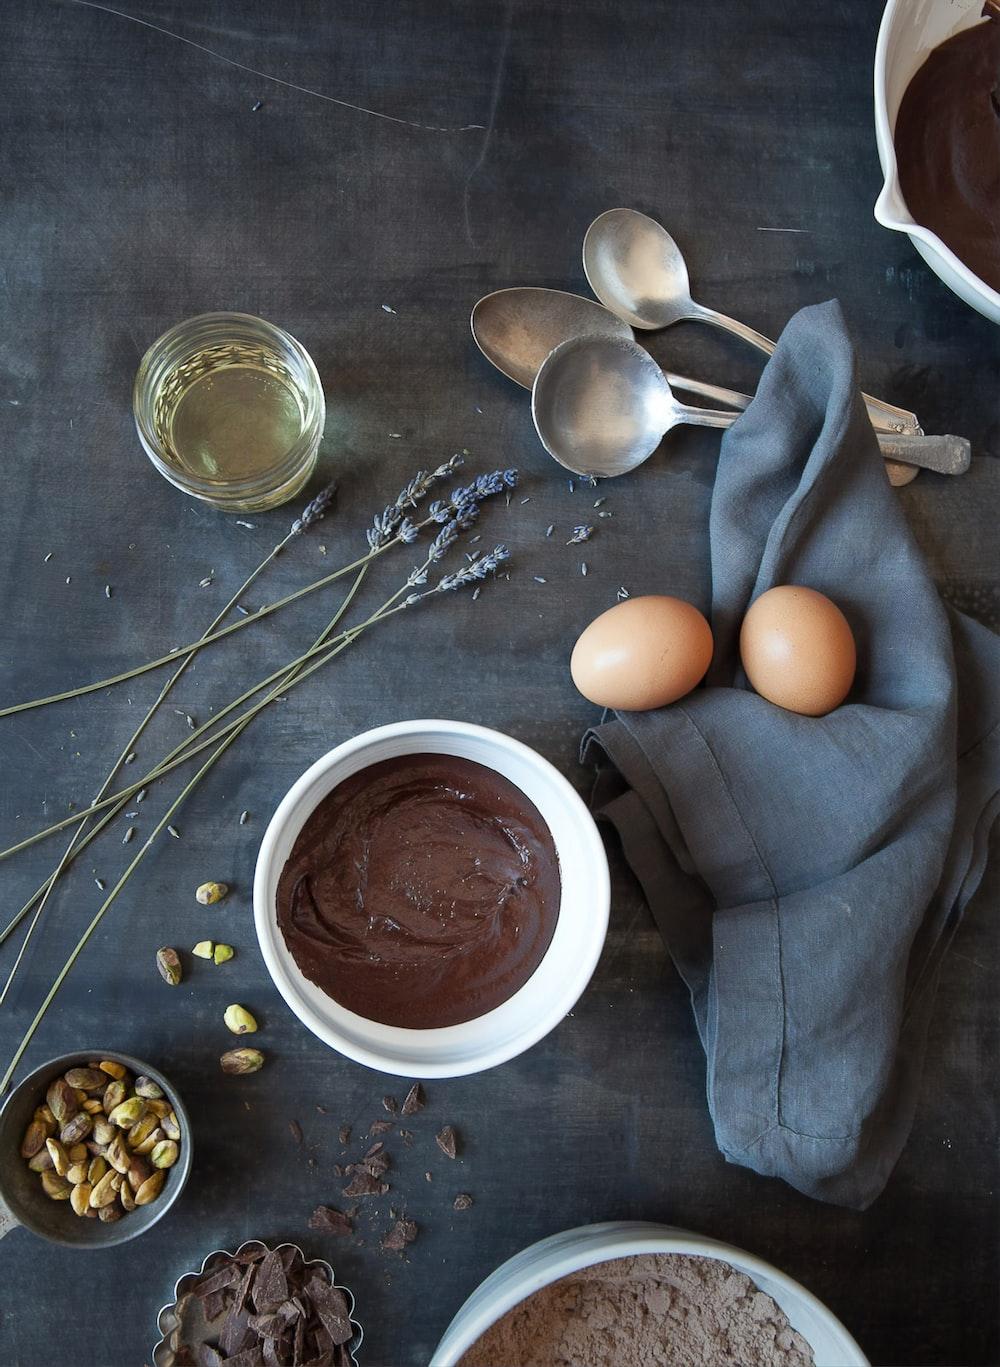 brown egg on white ceramic bowl beside stainless steel spoon